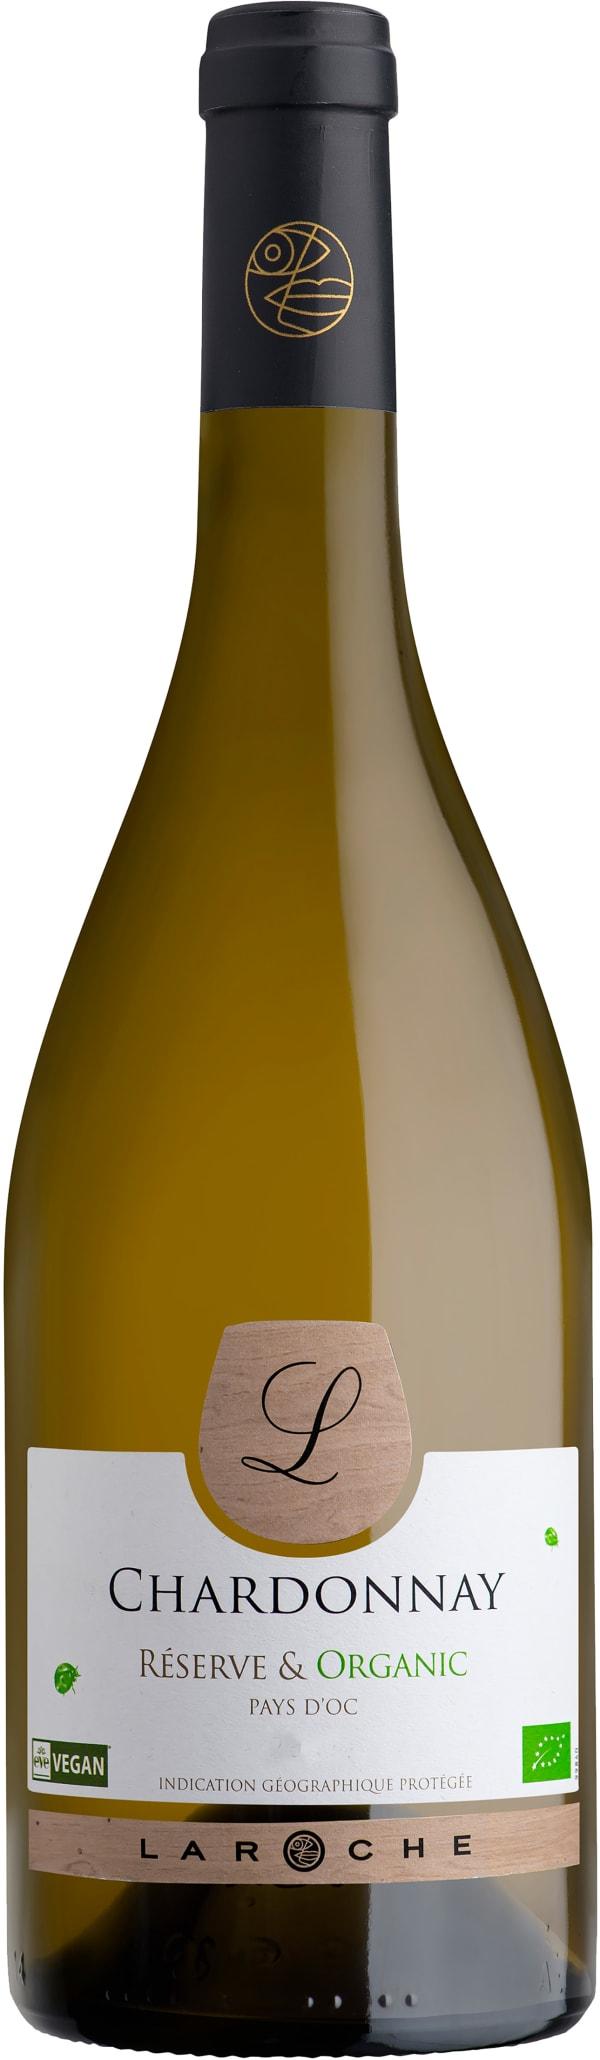 Laroche Réserve & Organic Chardonnay L 2018